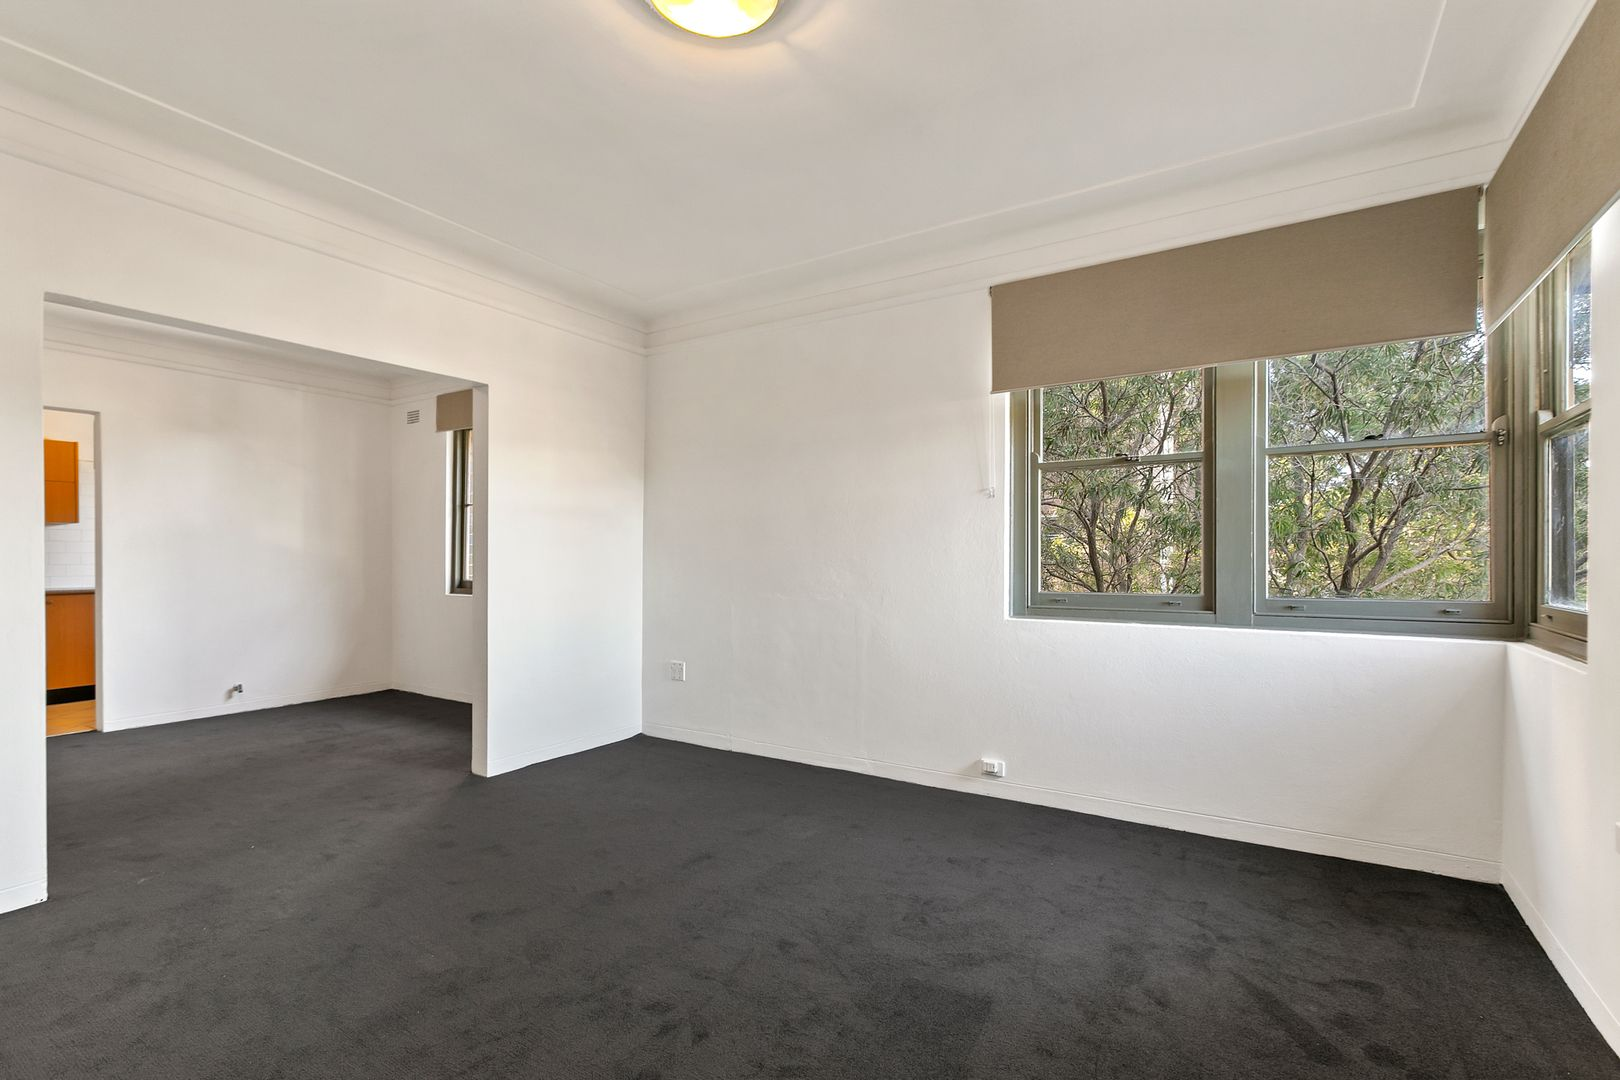 2/101 Lilyfield Road, Lilyfield NSW 2040, Image 1